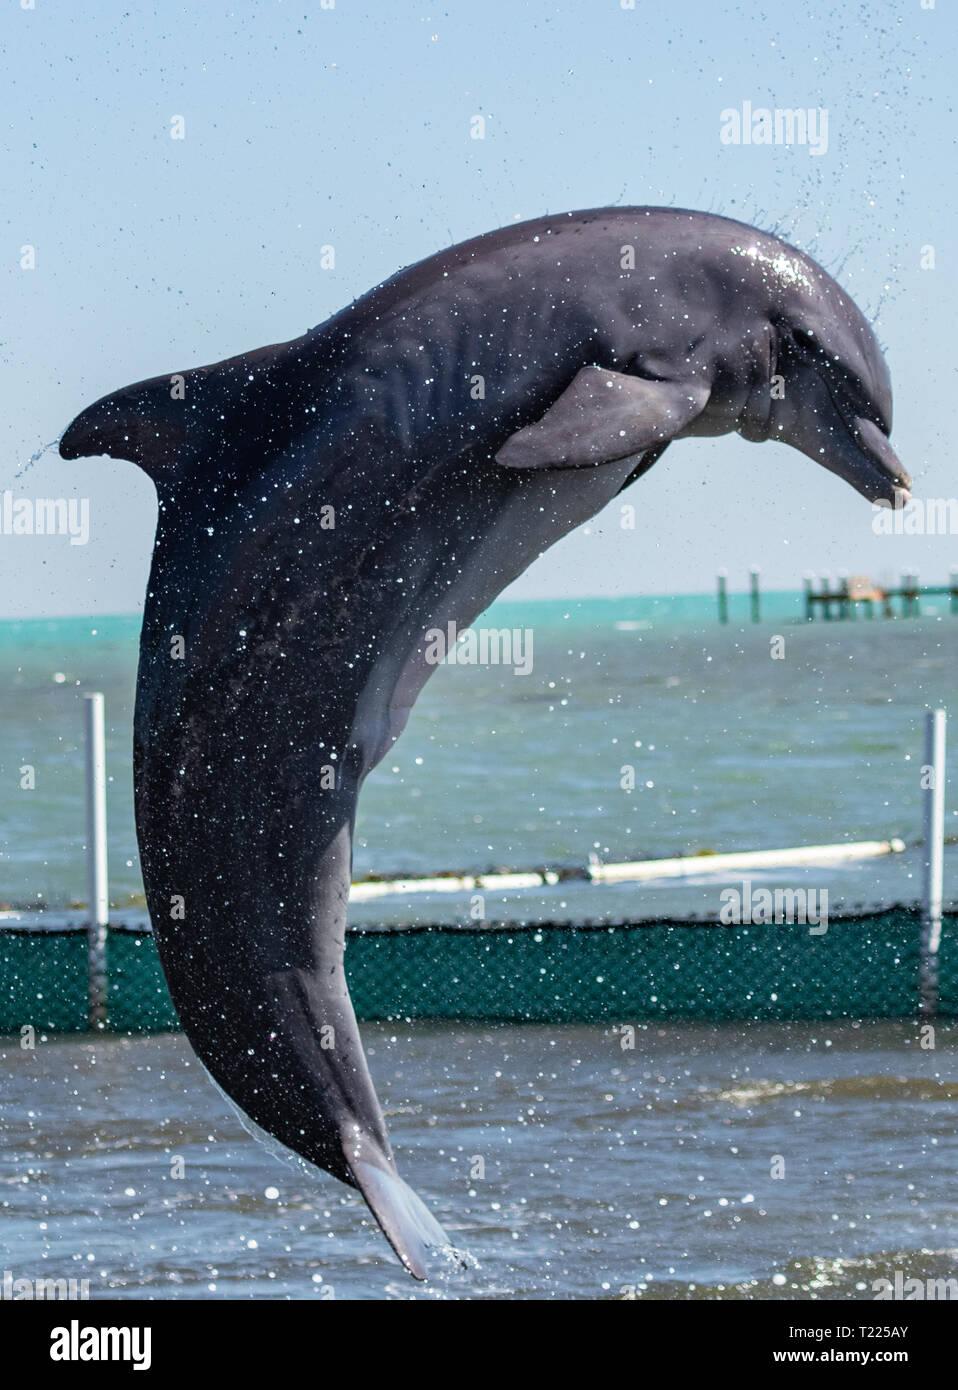 Dolphin Research Center Marathon, FL USA March 22 2019 - Stock Image